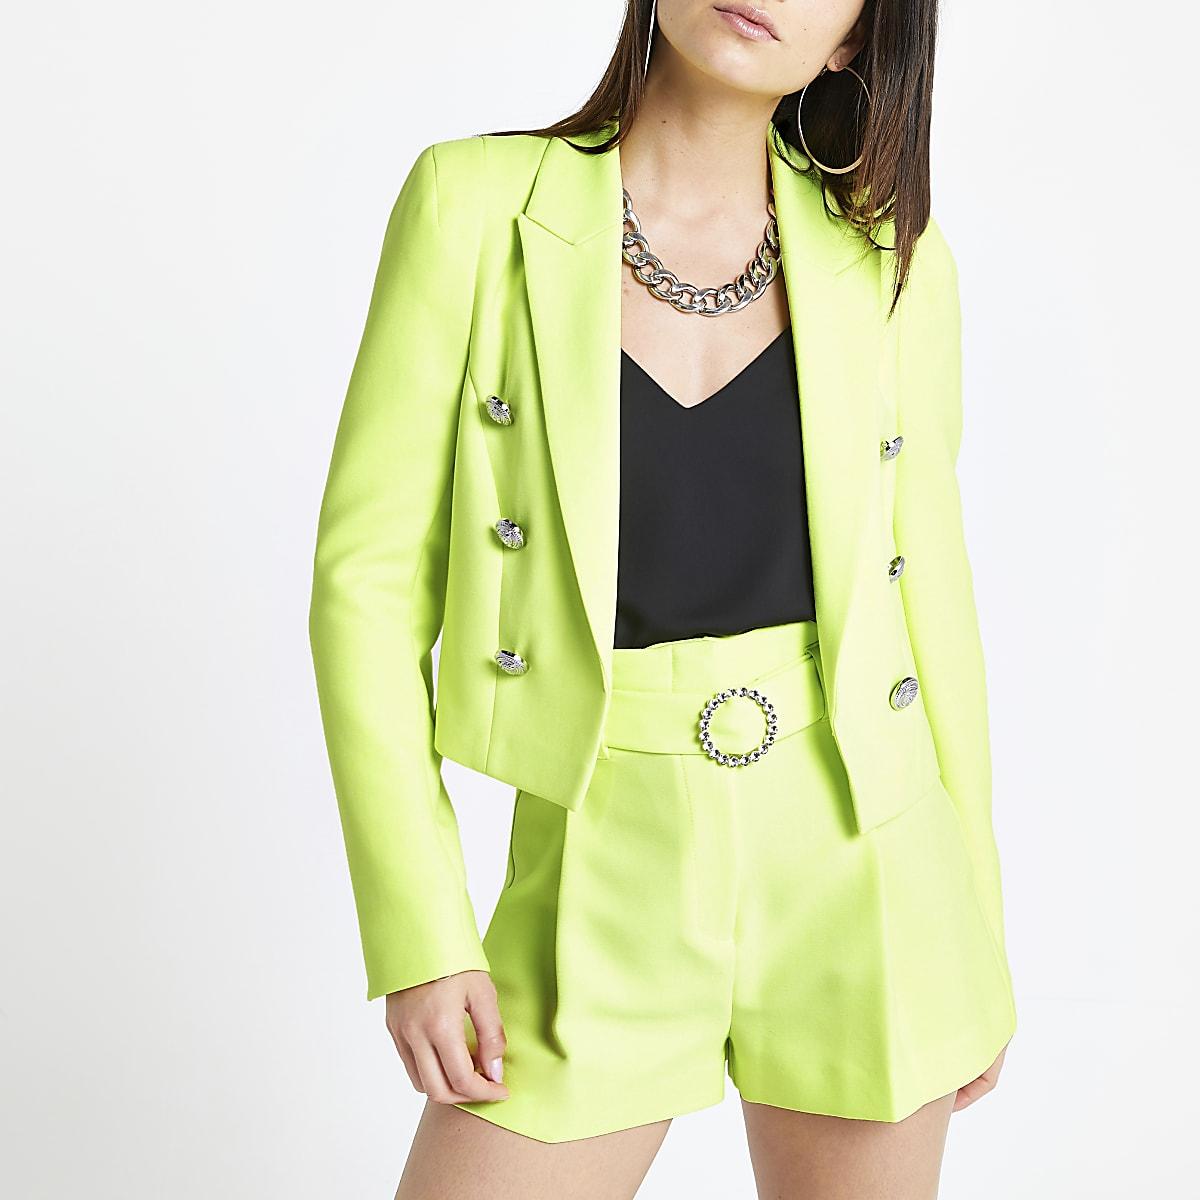 RI Petite - Neongele cropped blazer